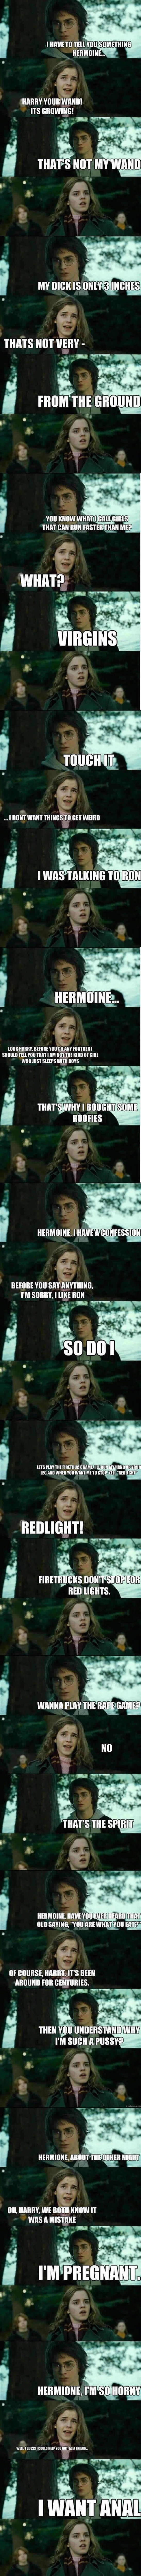 Dirty Harry Potter Jokes